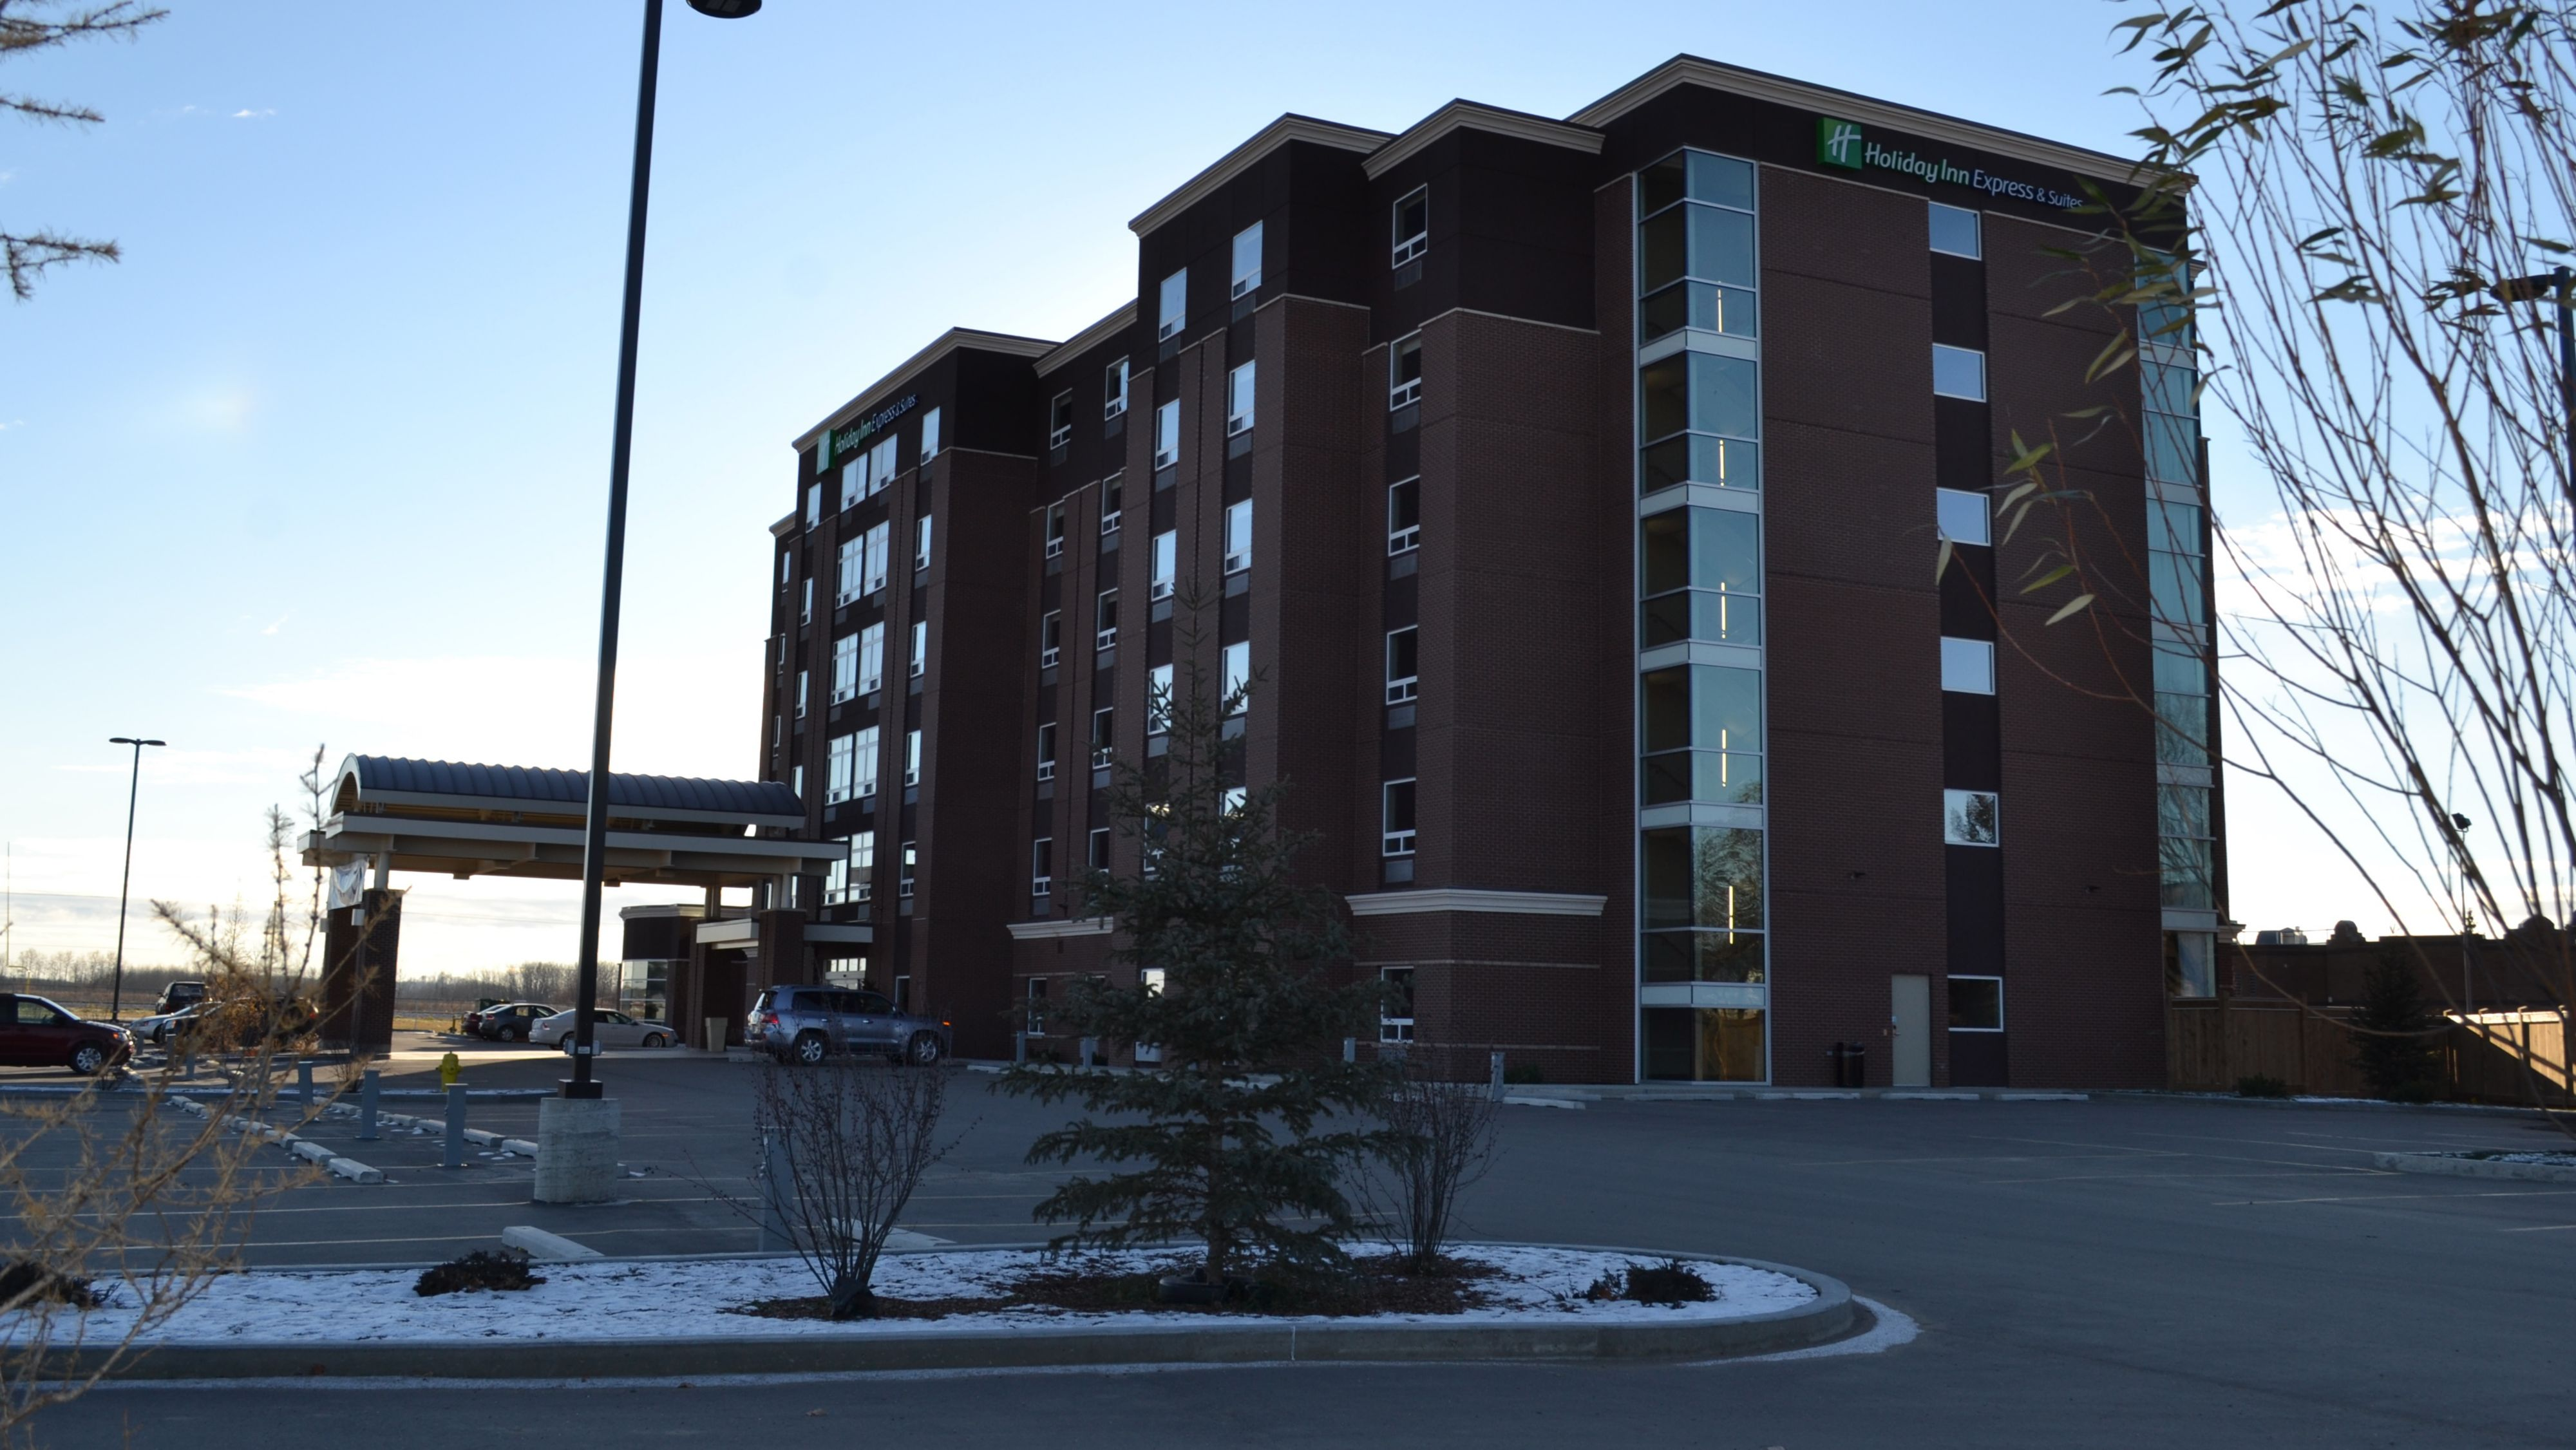 Holiday Inn Express & Suites Coeur D Alene I-90 Exit 11 image 5